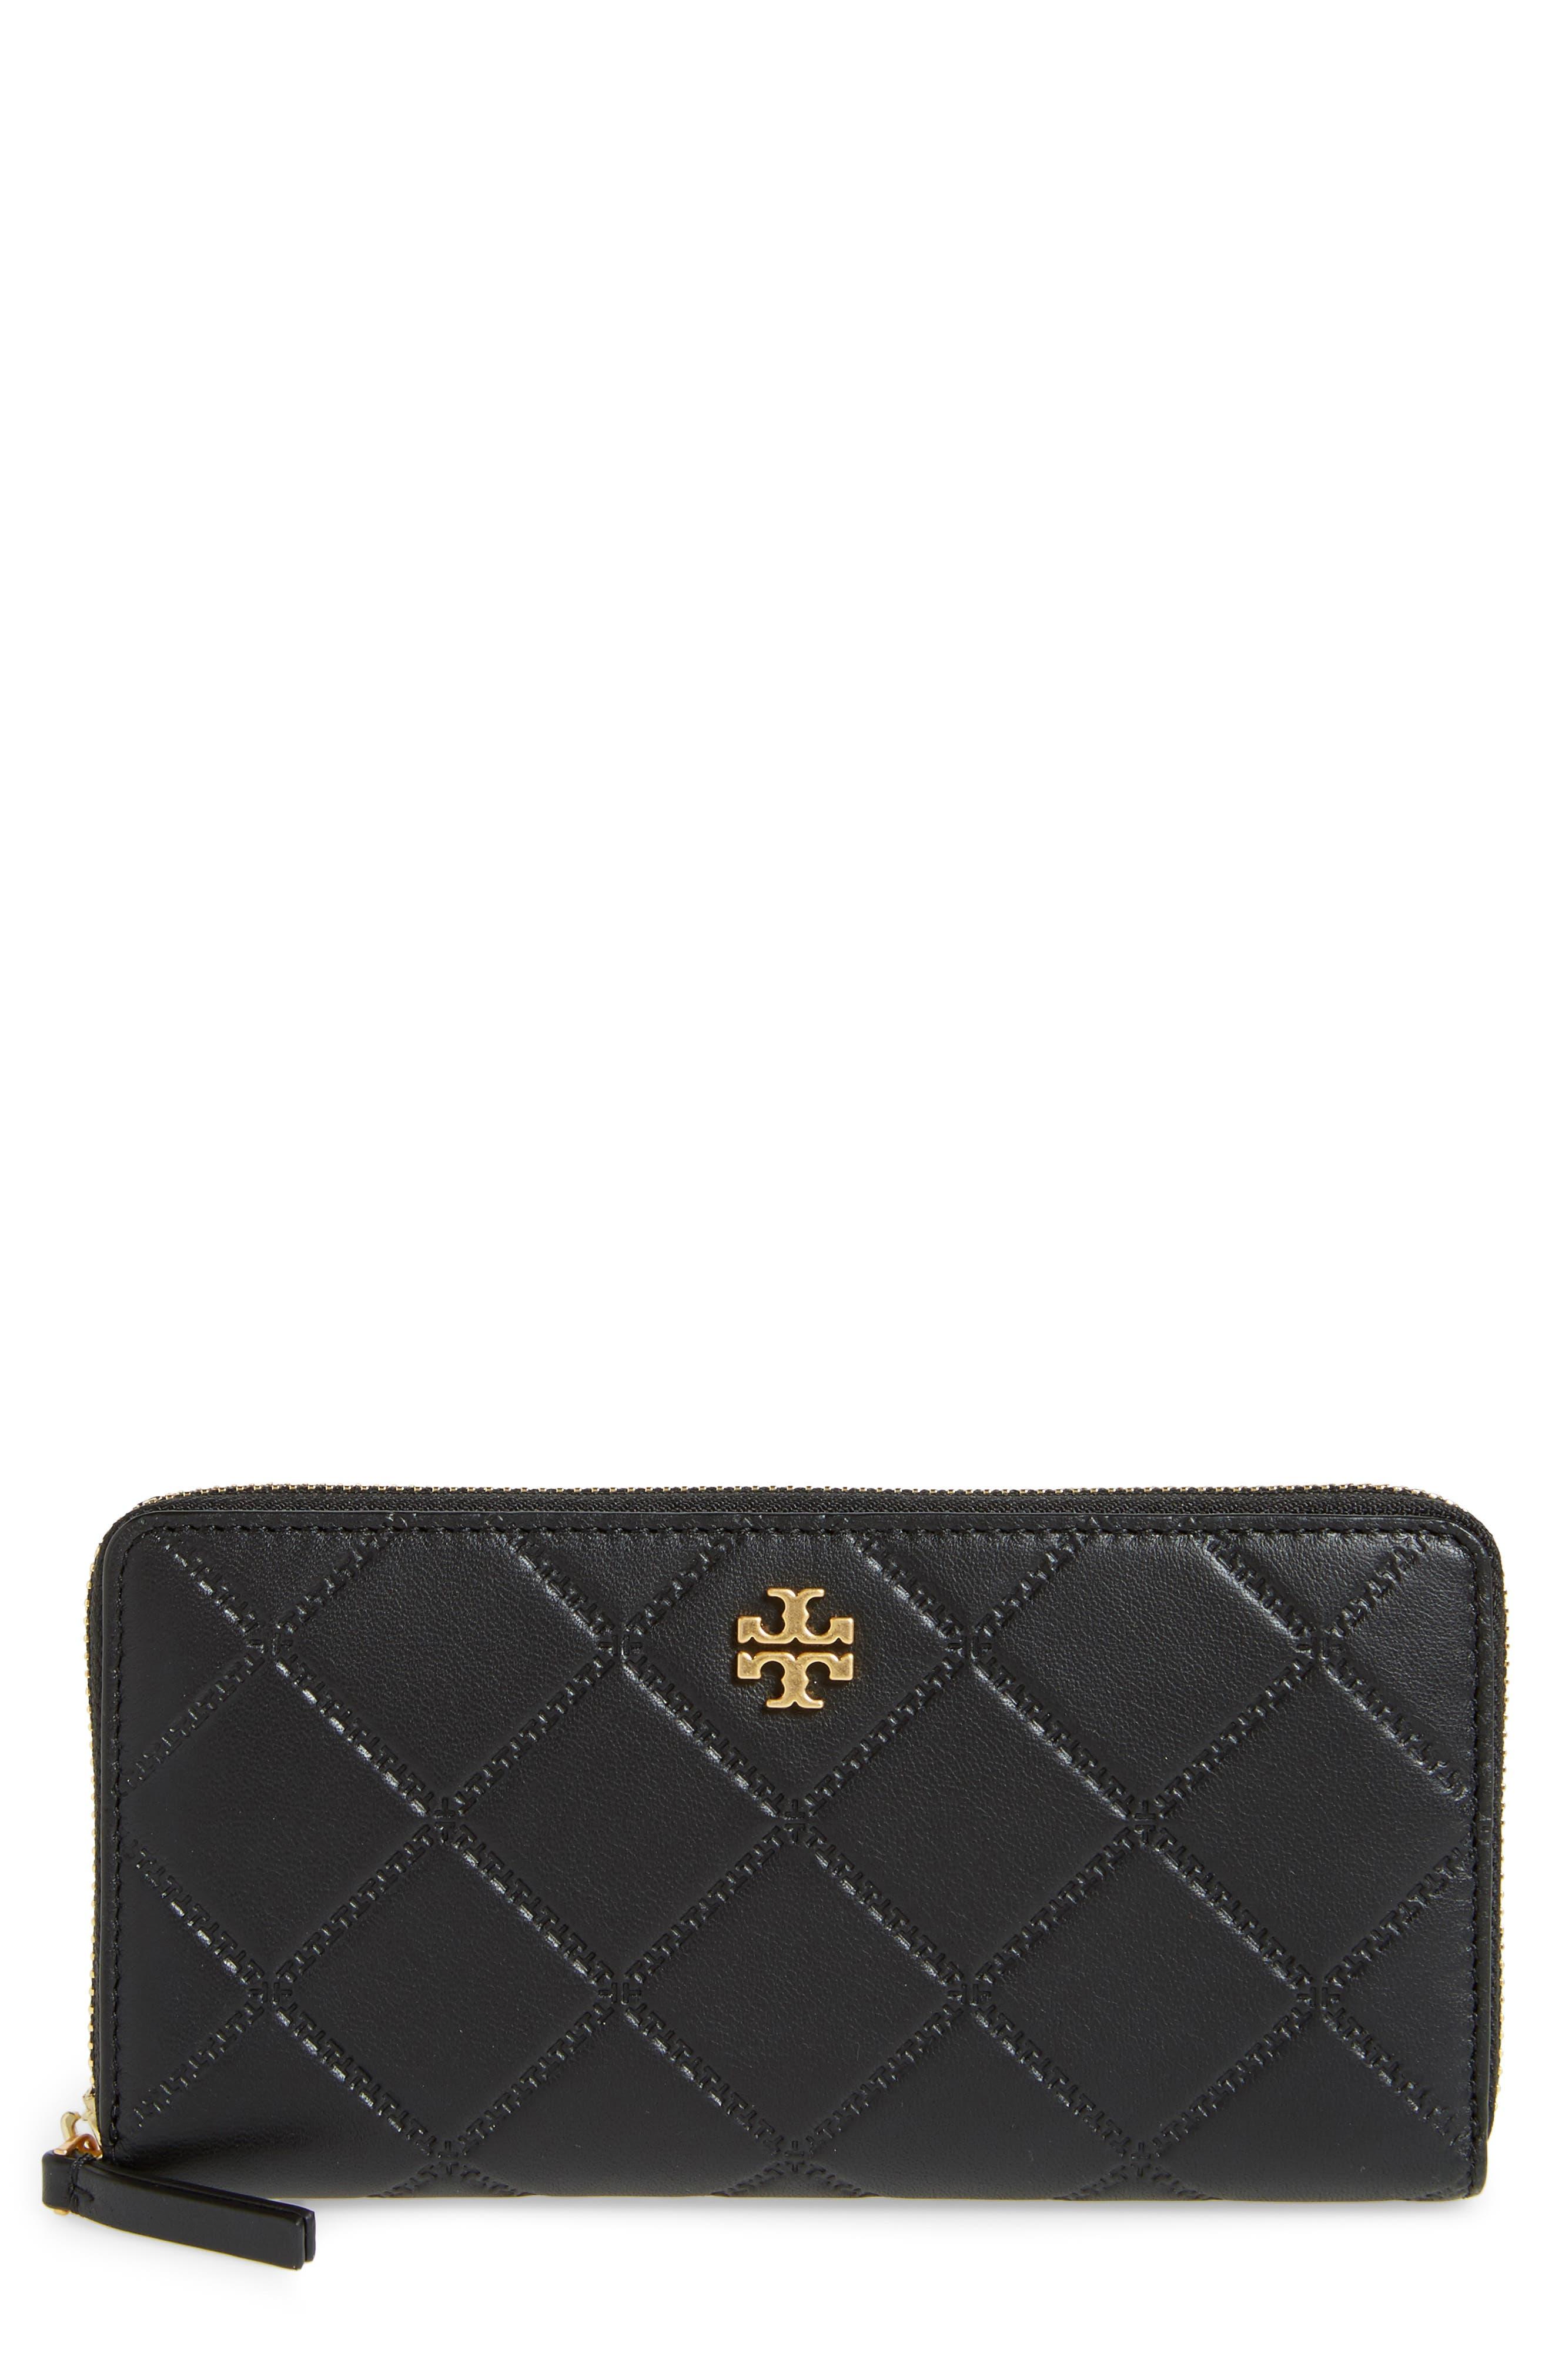 Georgia Zip Continental Wallet,                             Main thumbnail 1, color,                             Black